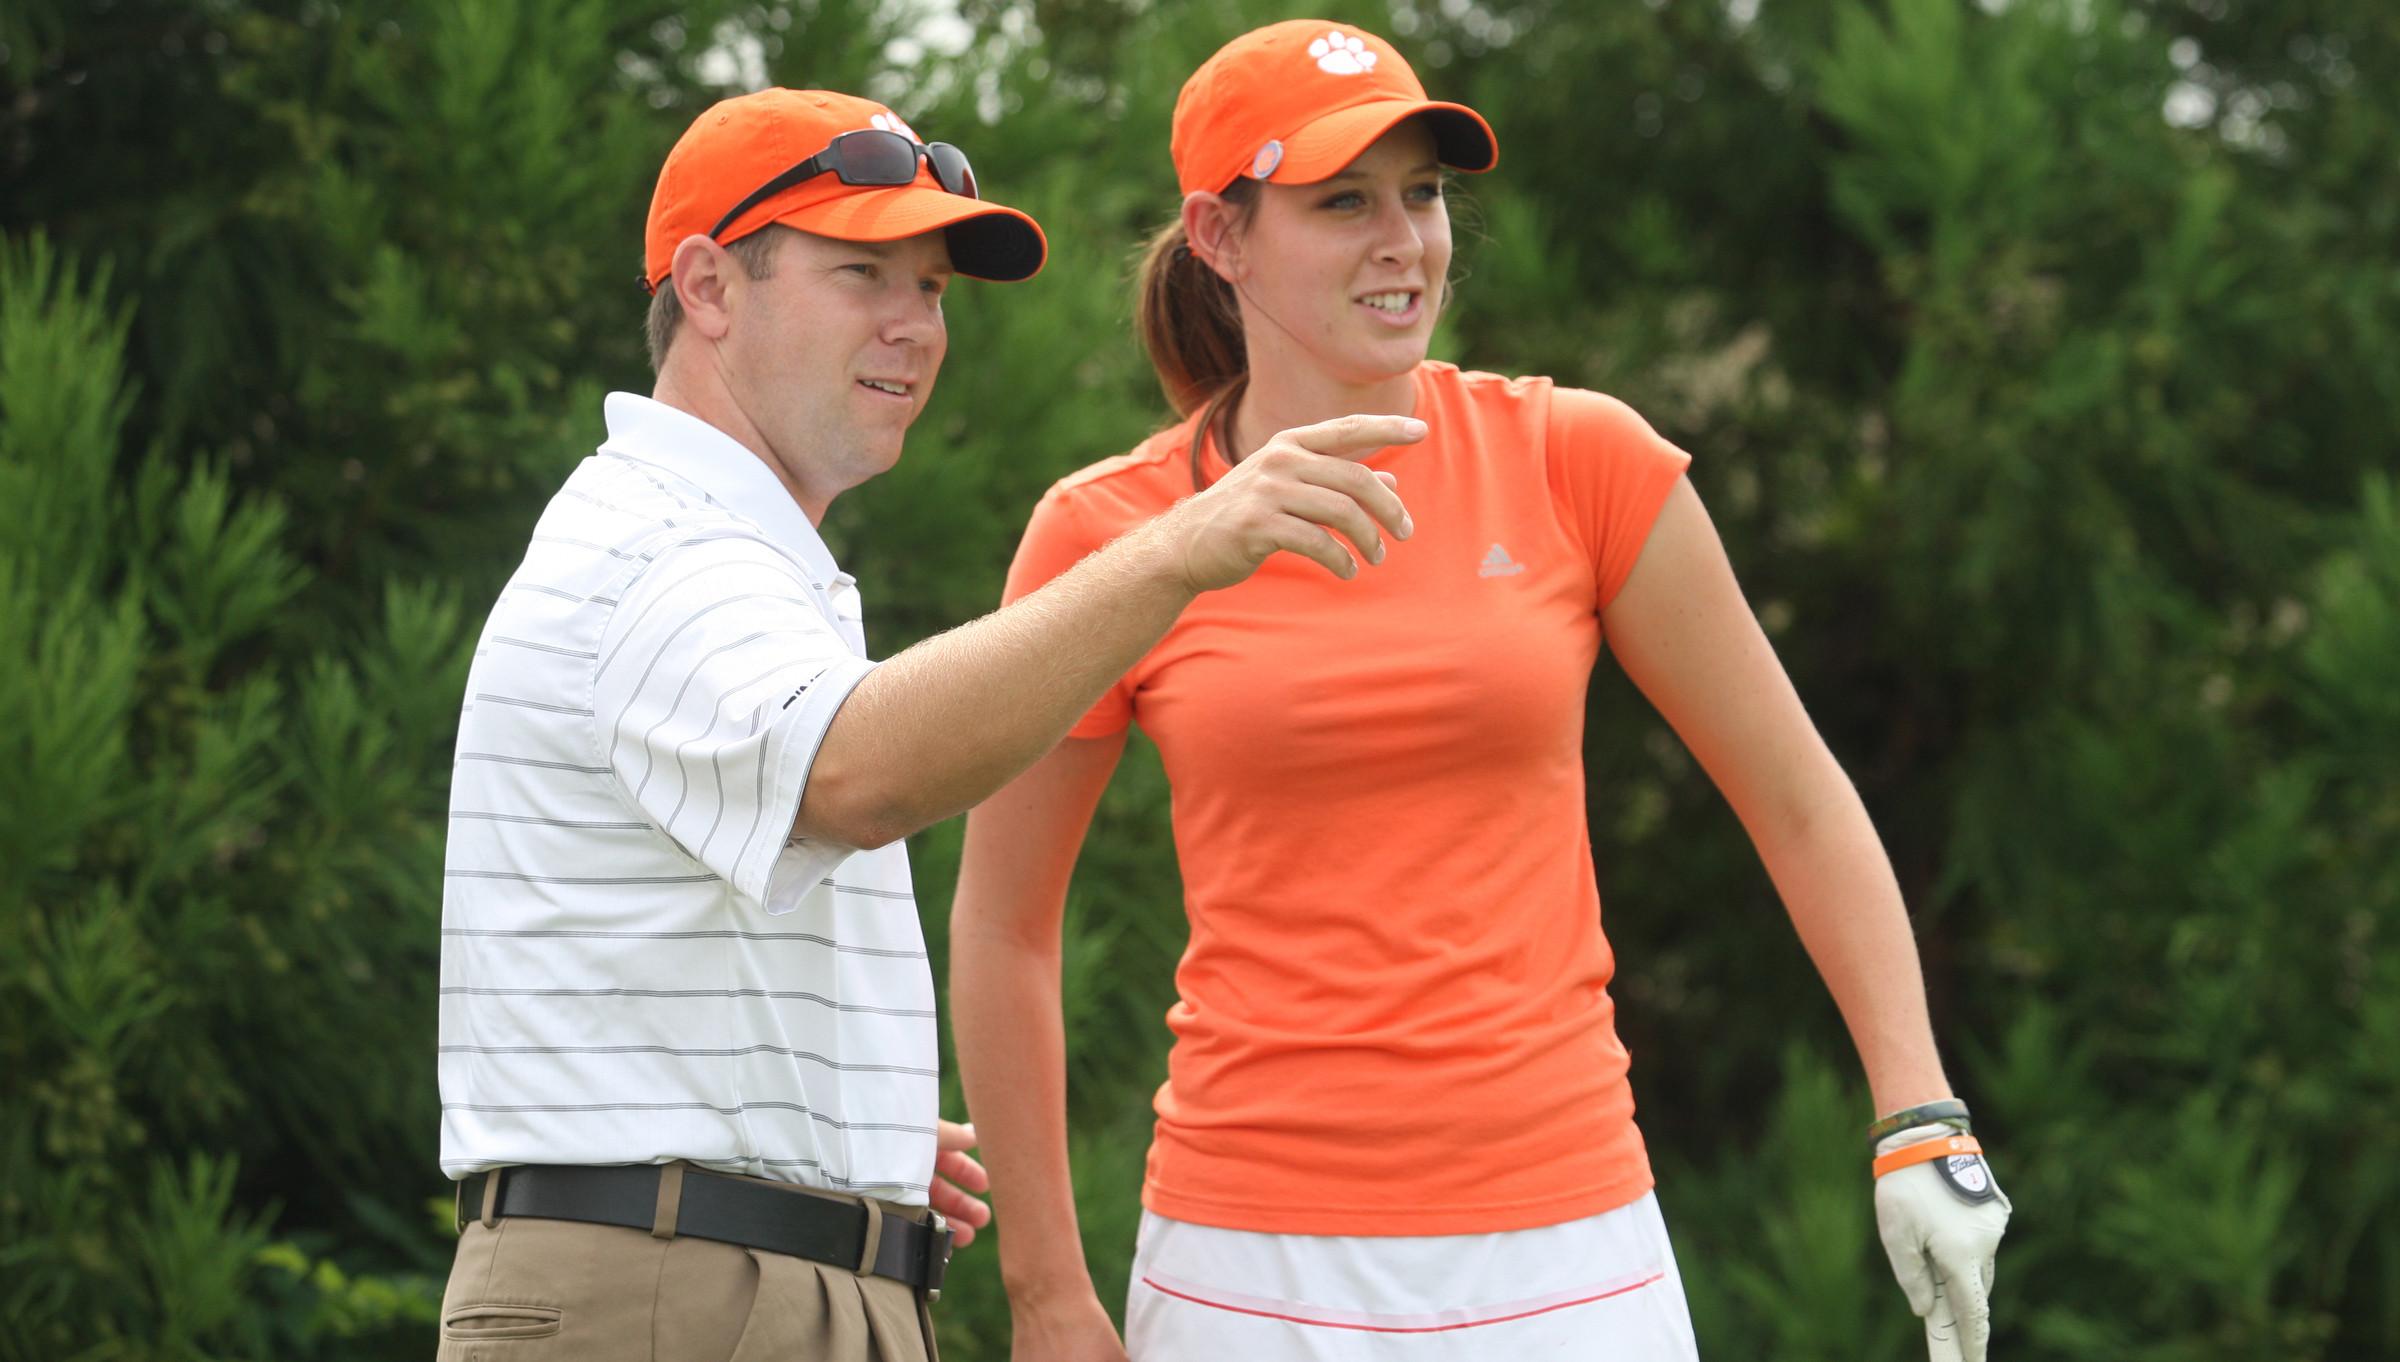 Clemson Women's Golf Team 13th in Latest GolfWorld Coaches Poll